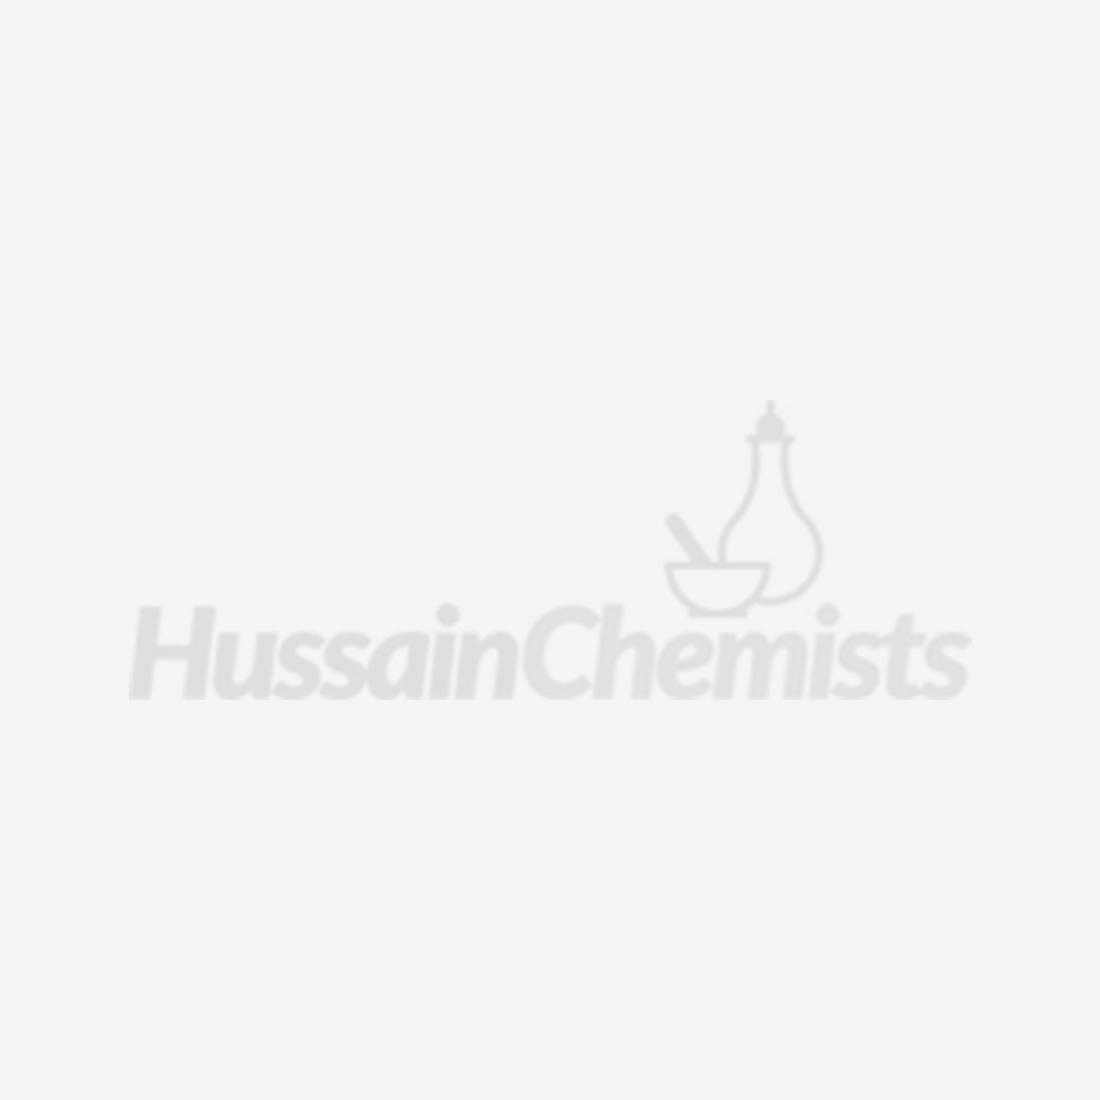 Carex 5L Handwash Professional Original 2 x 5 litre - UK STOCK